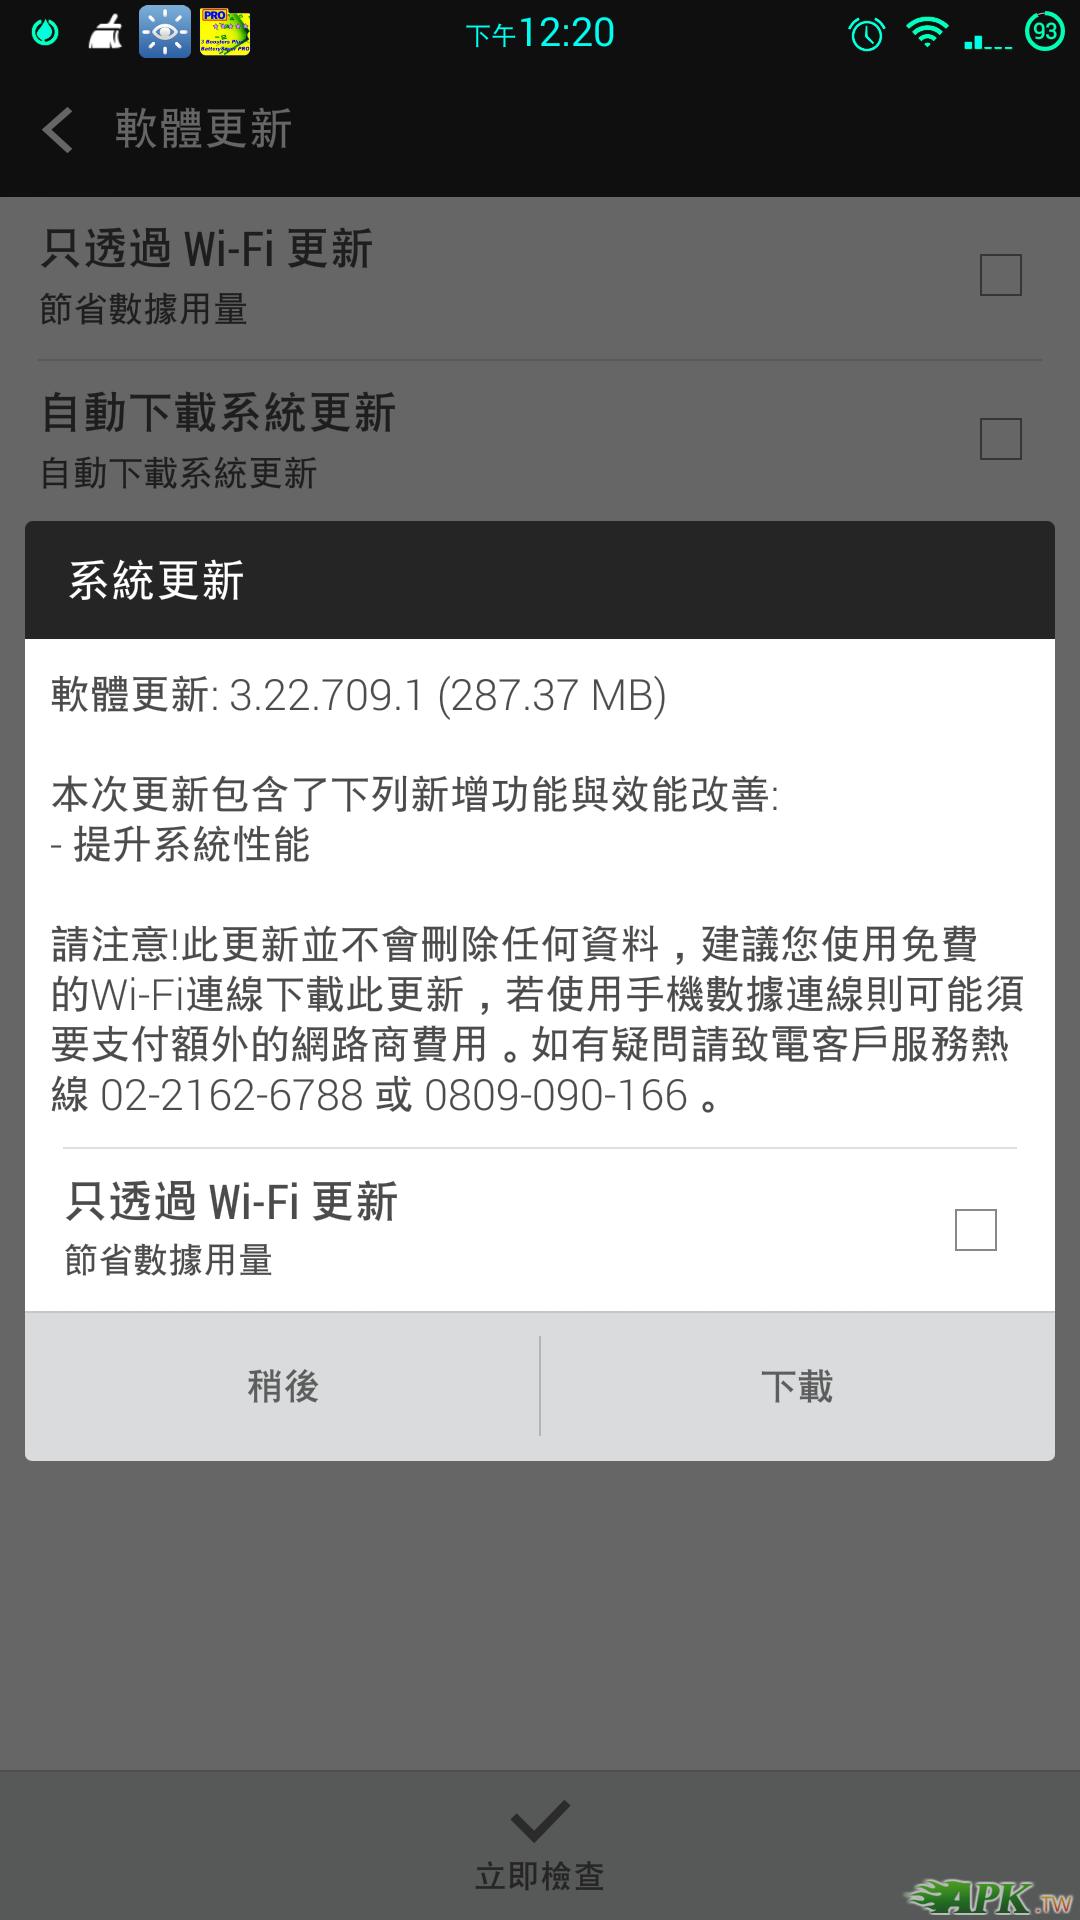 Screenshot_2014-07-30-12-21-00.png